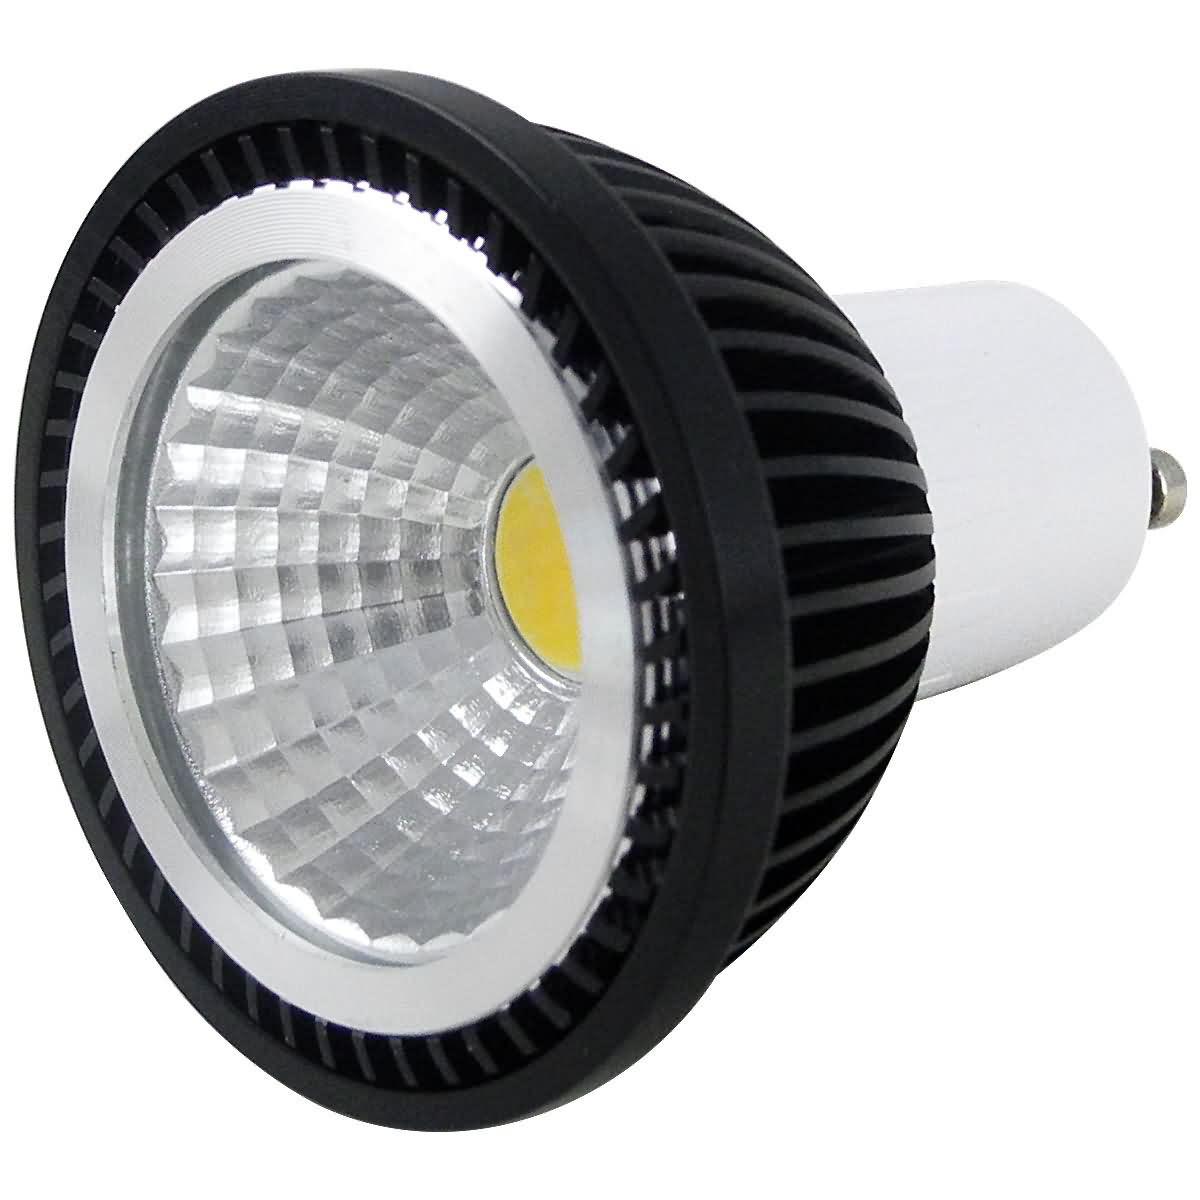 gu10 3w led spotlight cob led bulb in warm white energy saving lamp 120 led lights. Black Bedroom Furniture Sets. Home Design Ideas